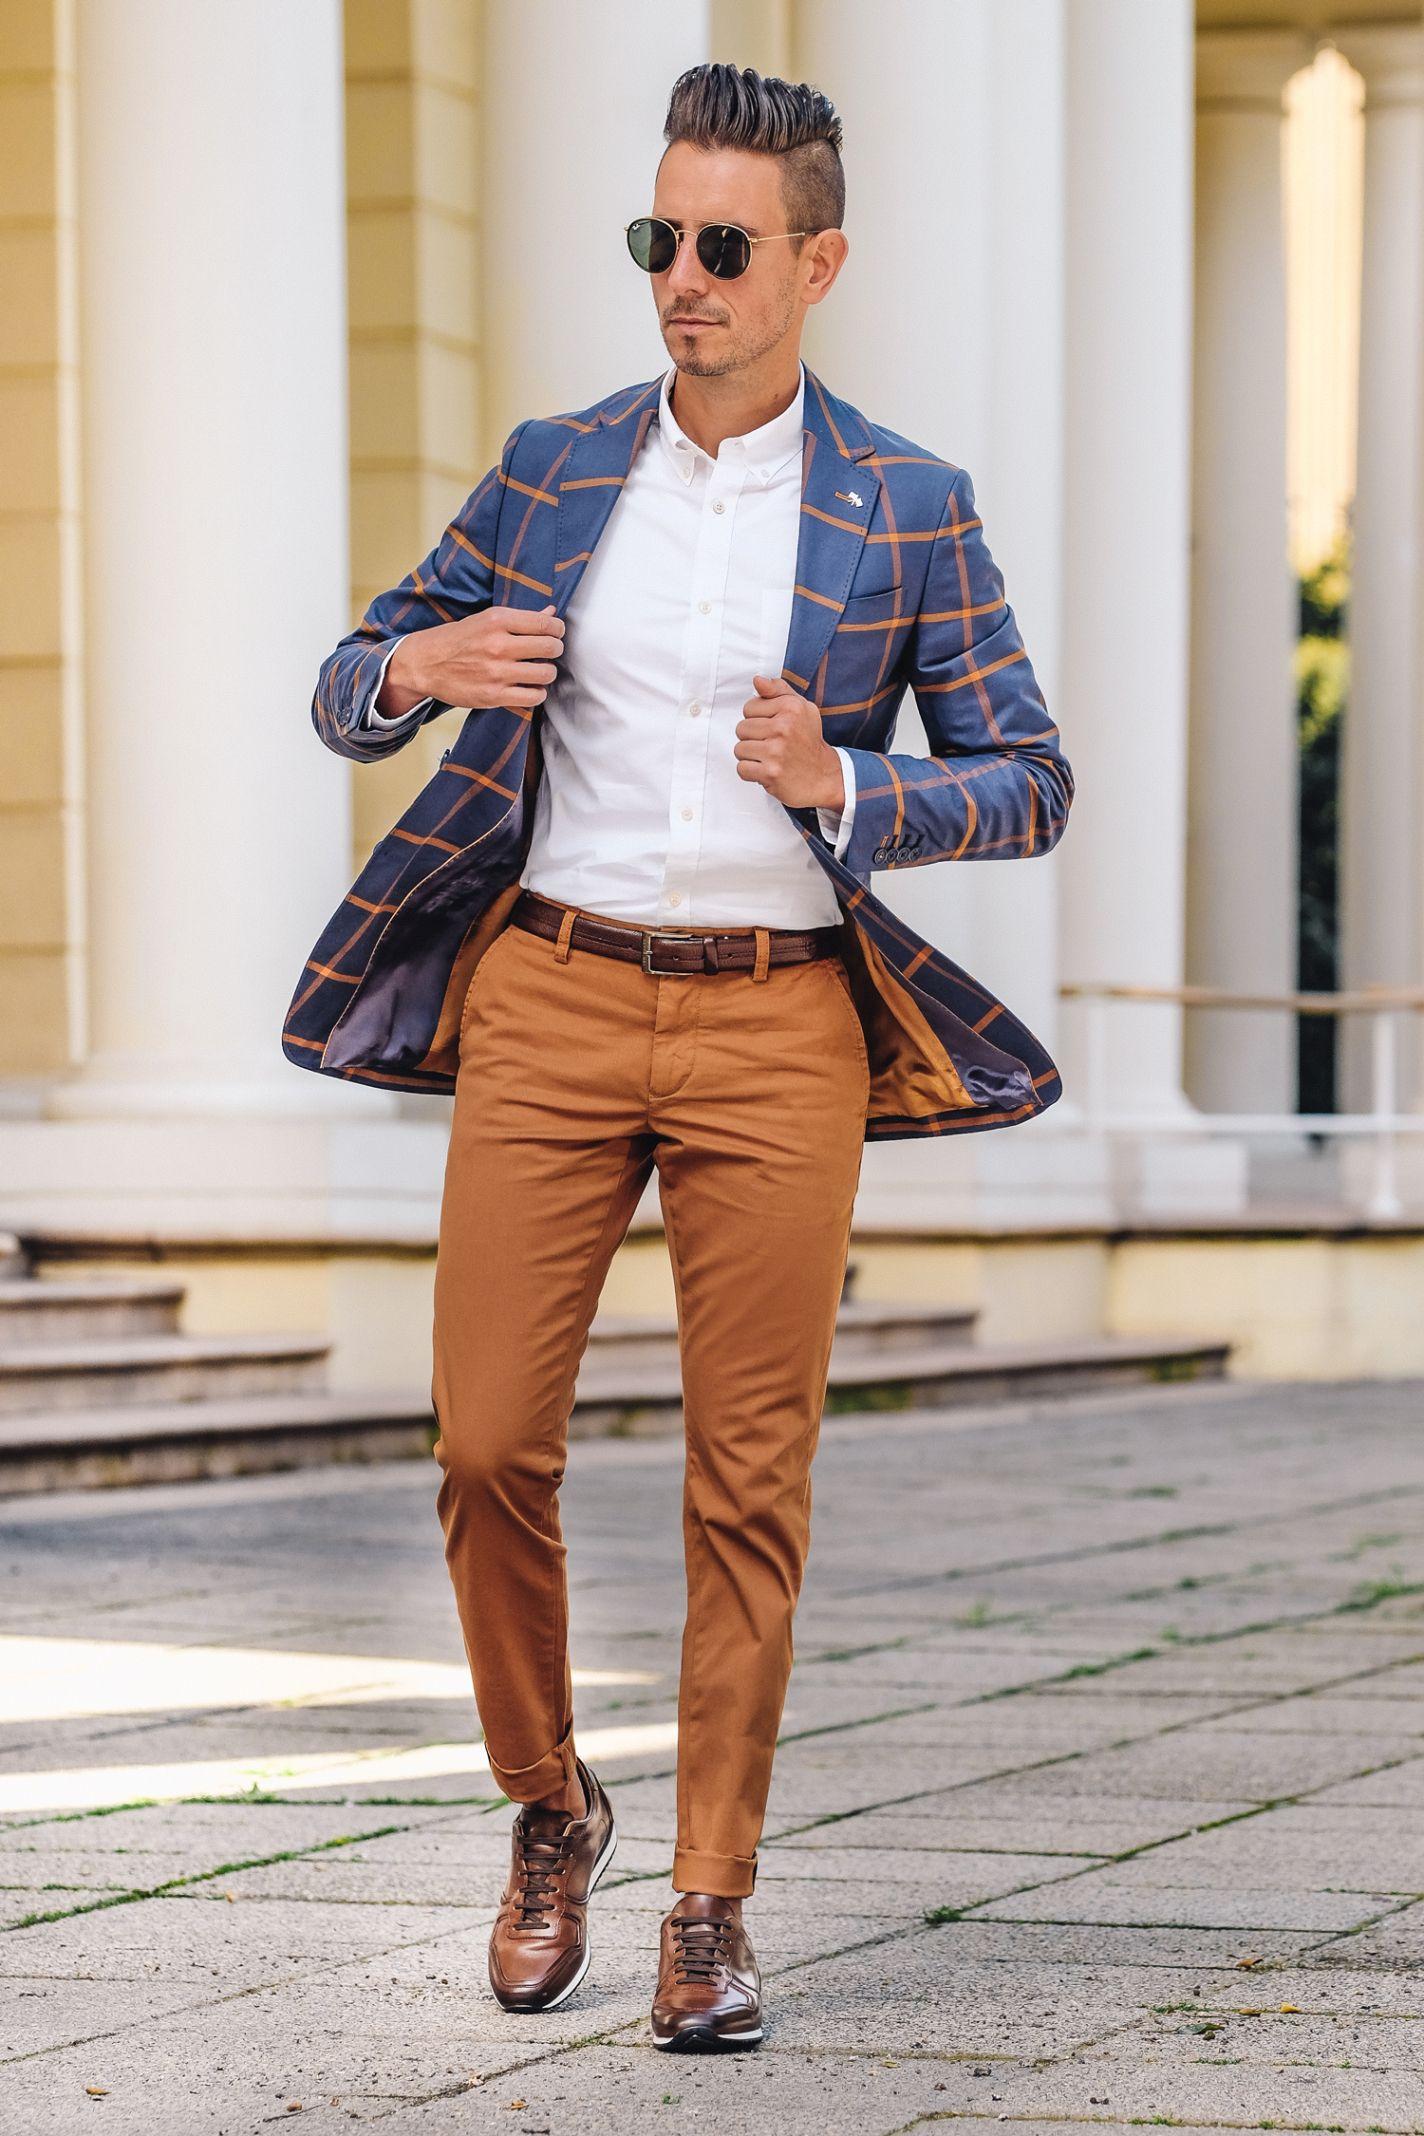 Fancy Dapper Men Smart Casual White Shirt Leather Shoes Brown